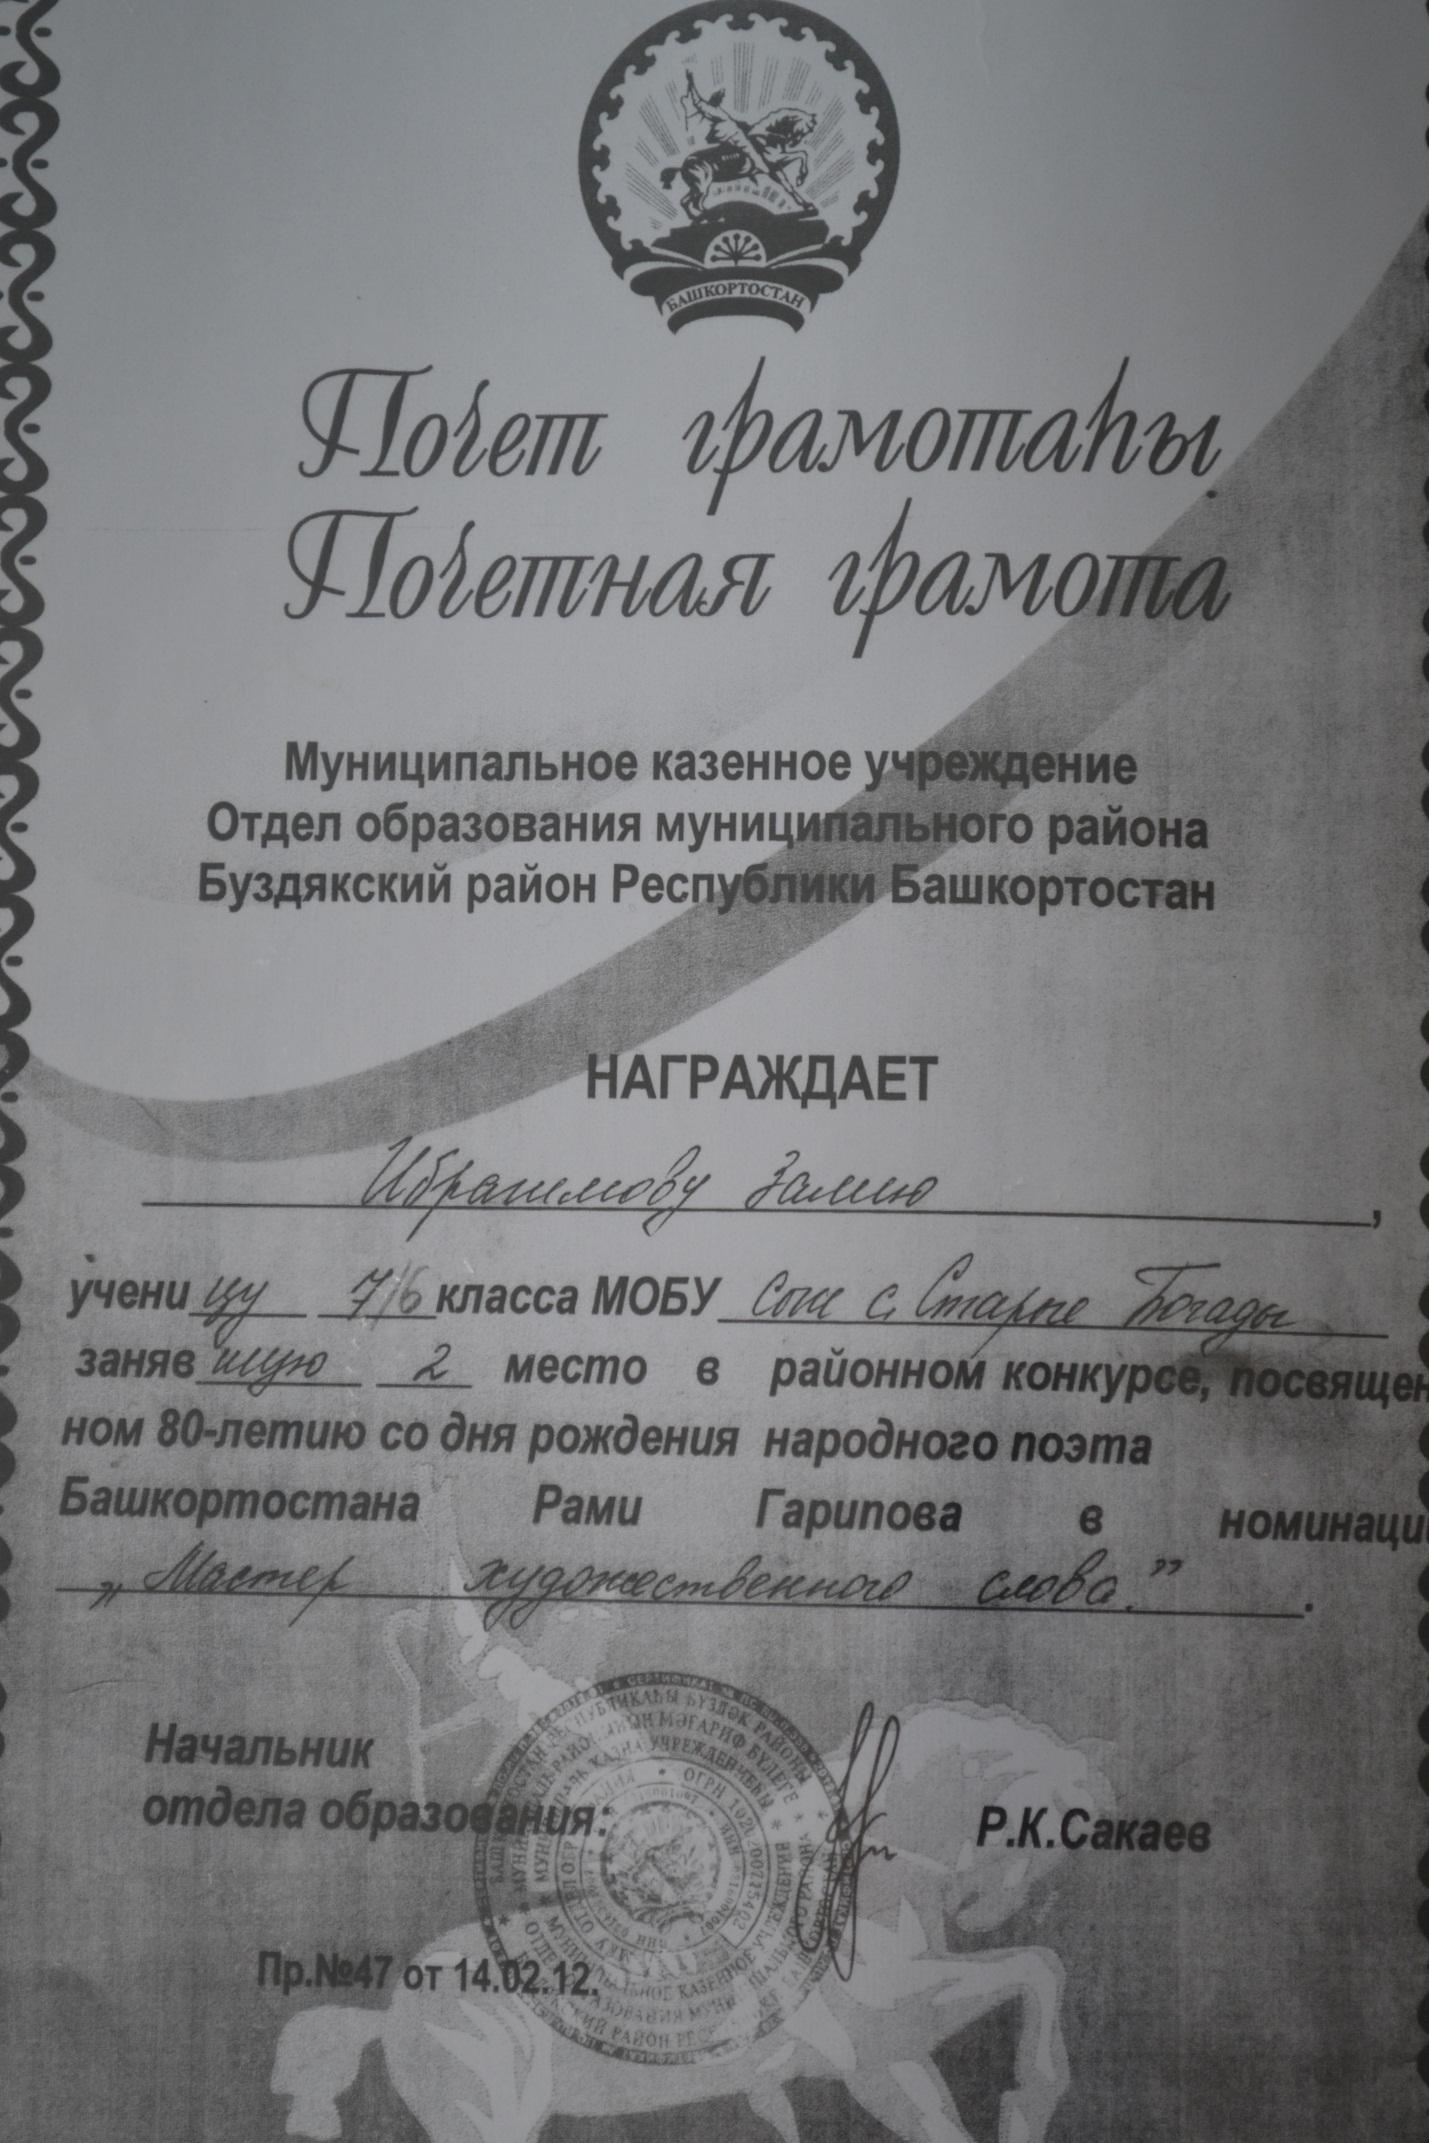 H:\DCIM\101D3100\DSC_0423.JPG